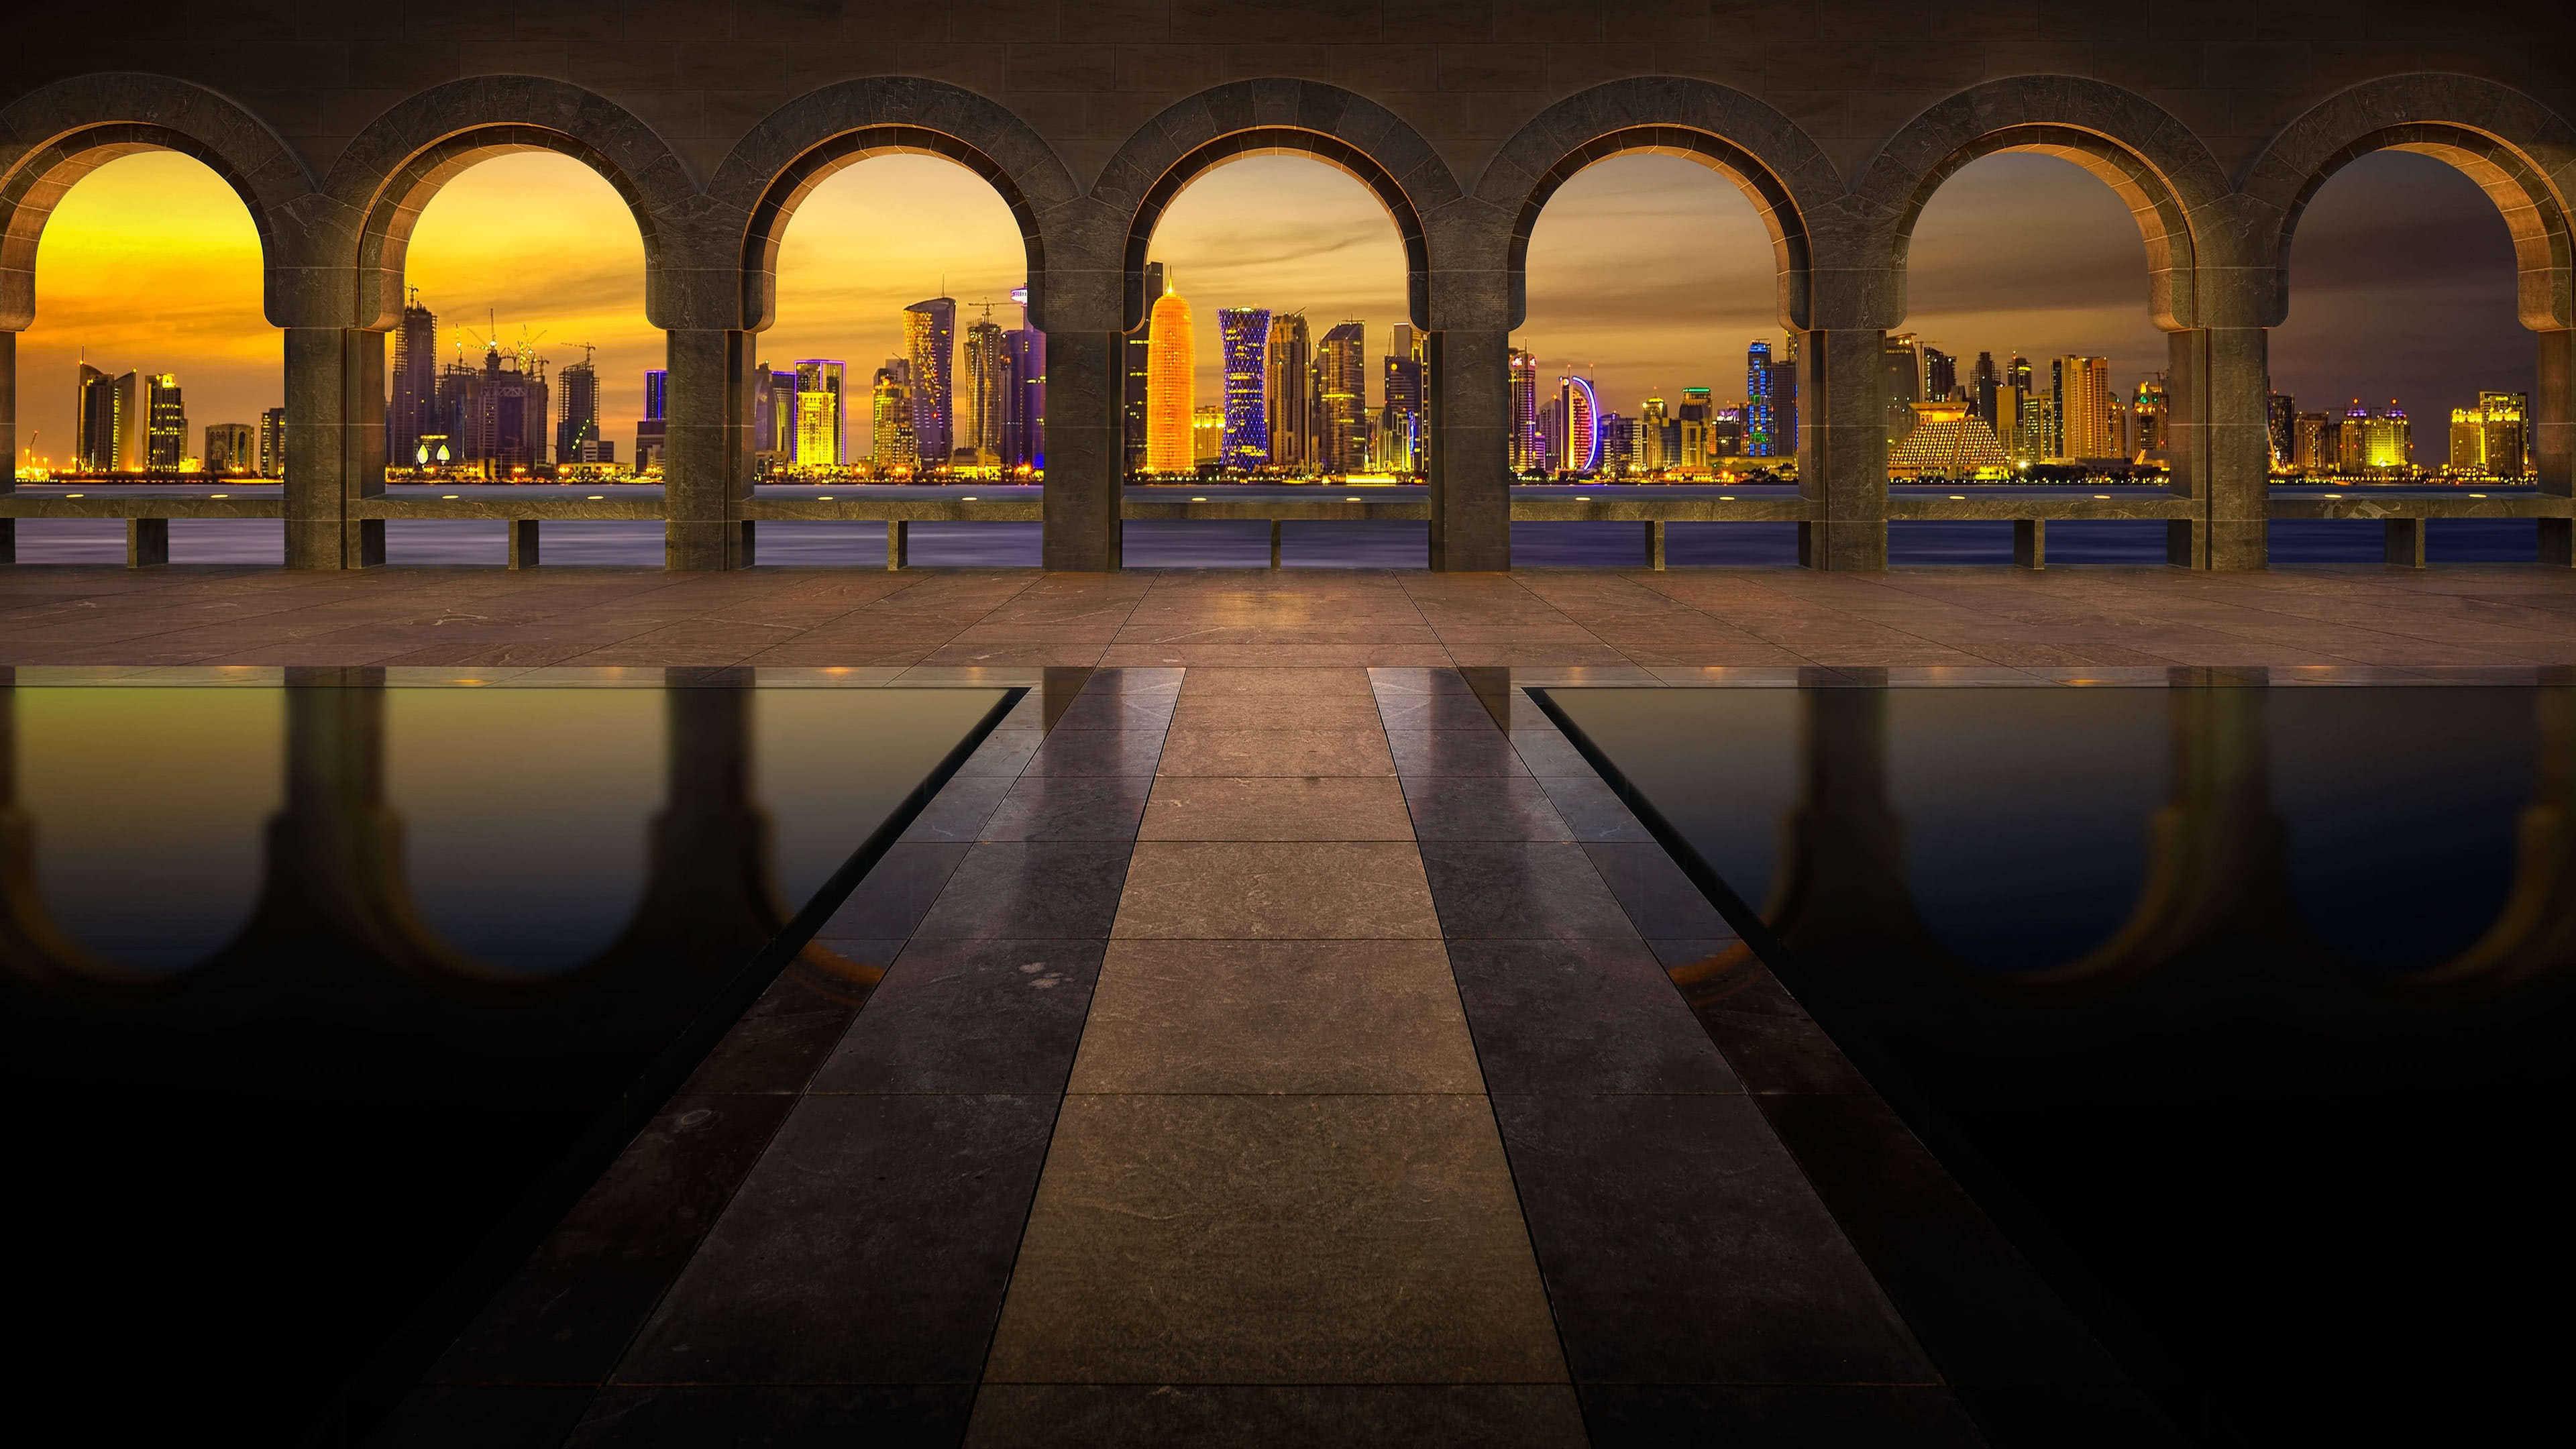 qatar city skyline at night uhd 4k wallpaper